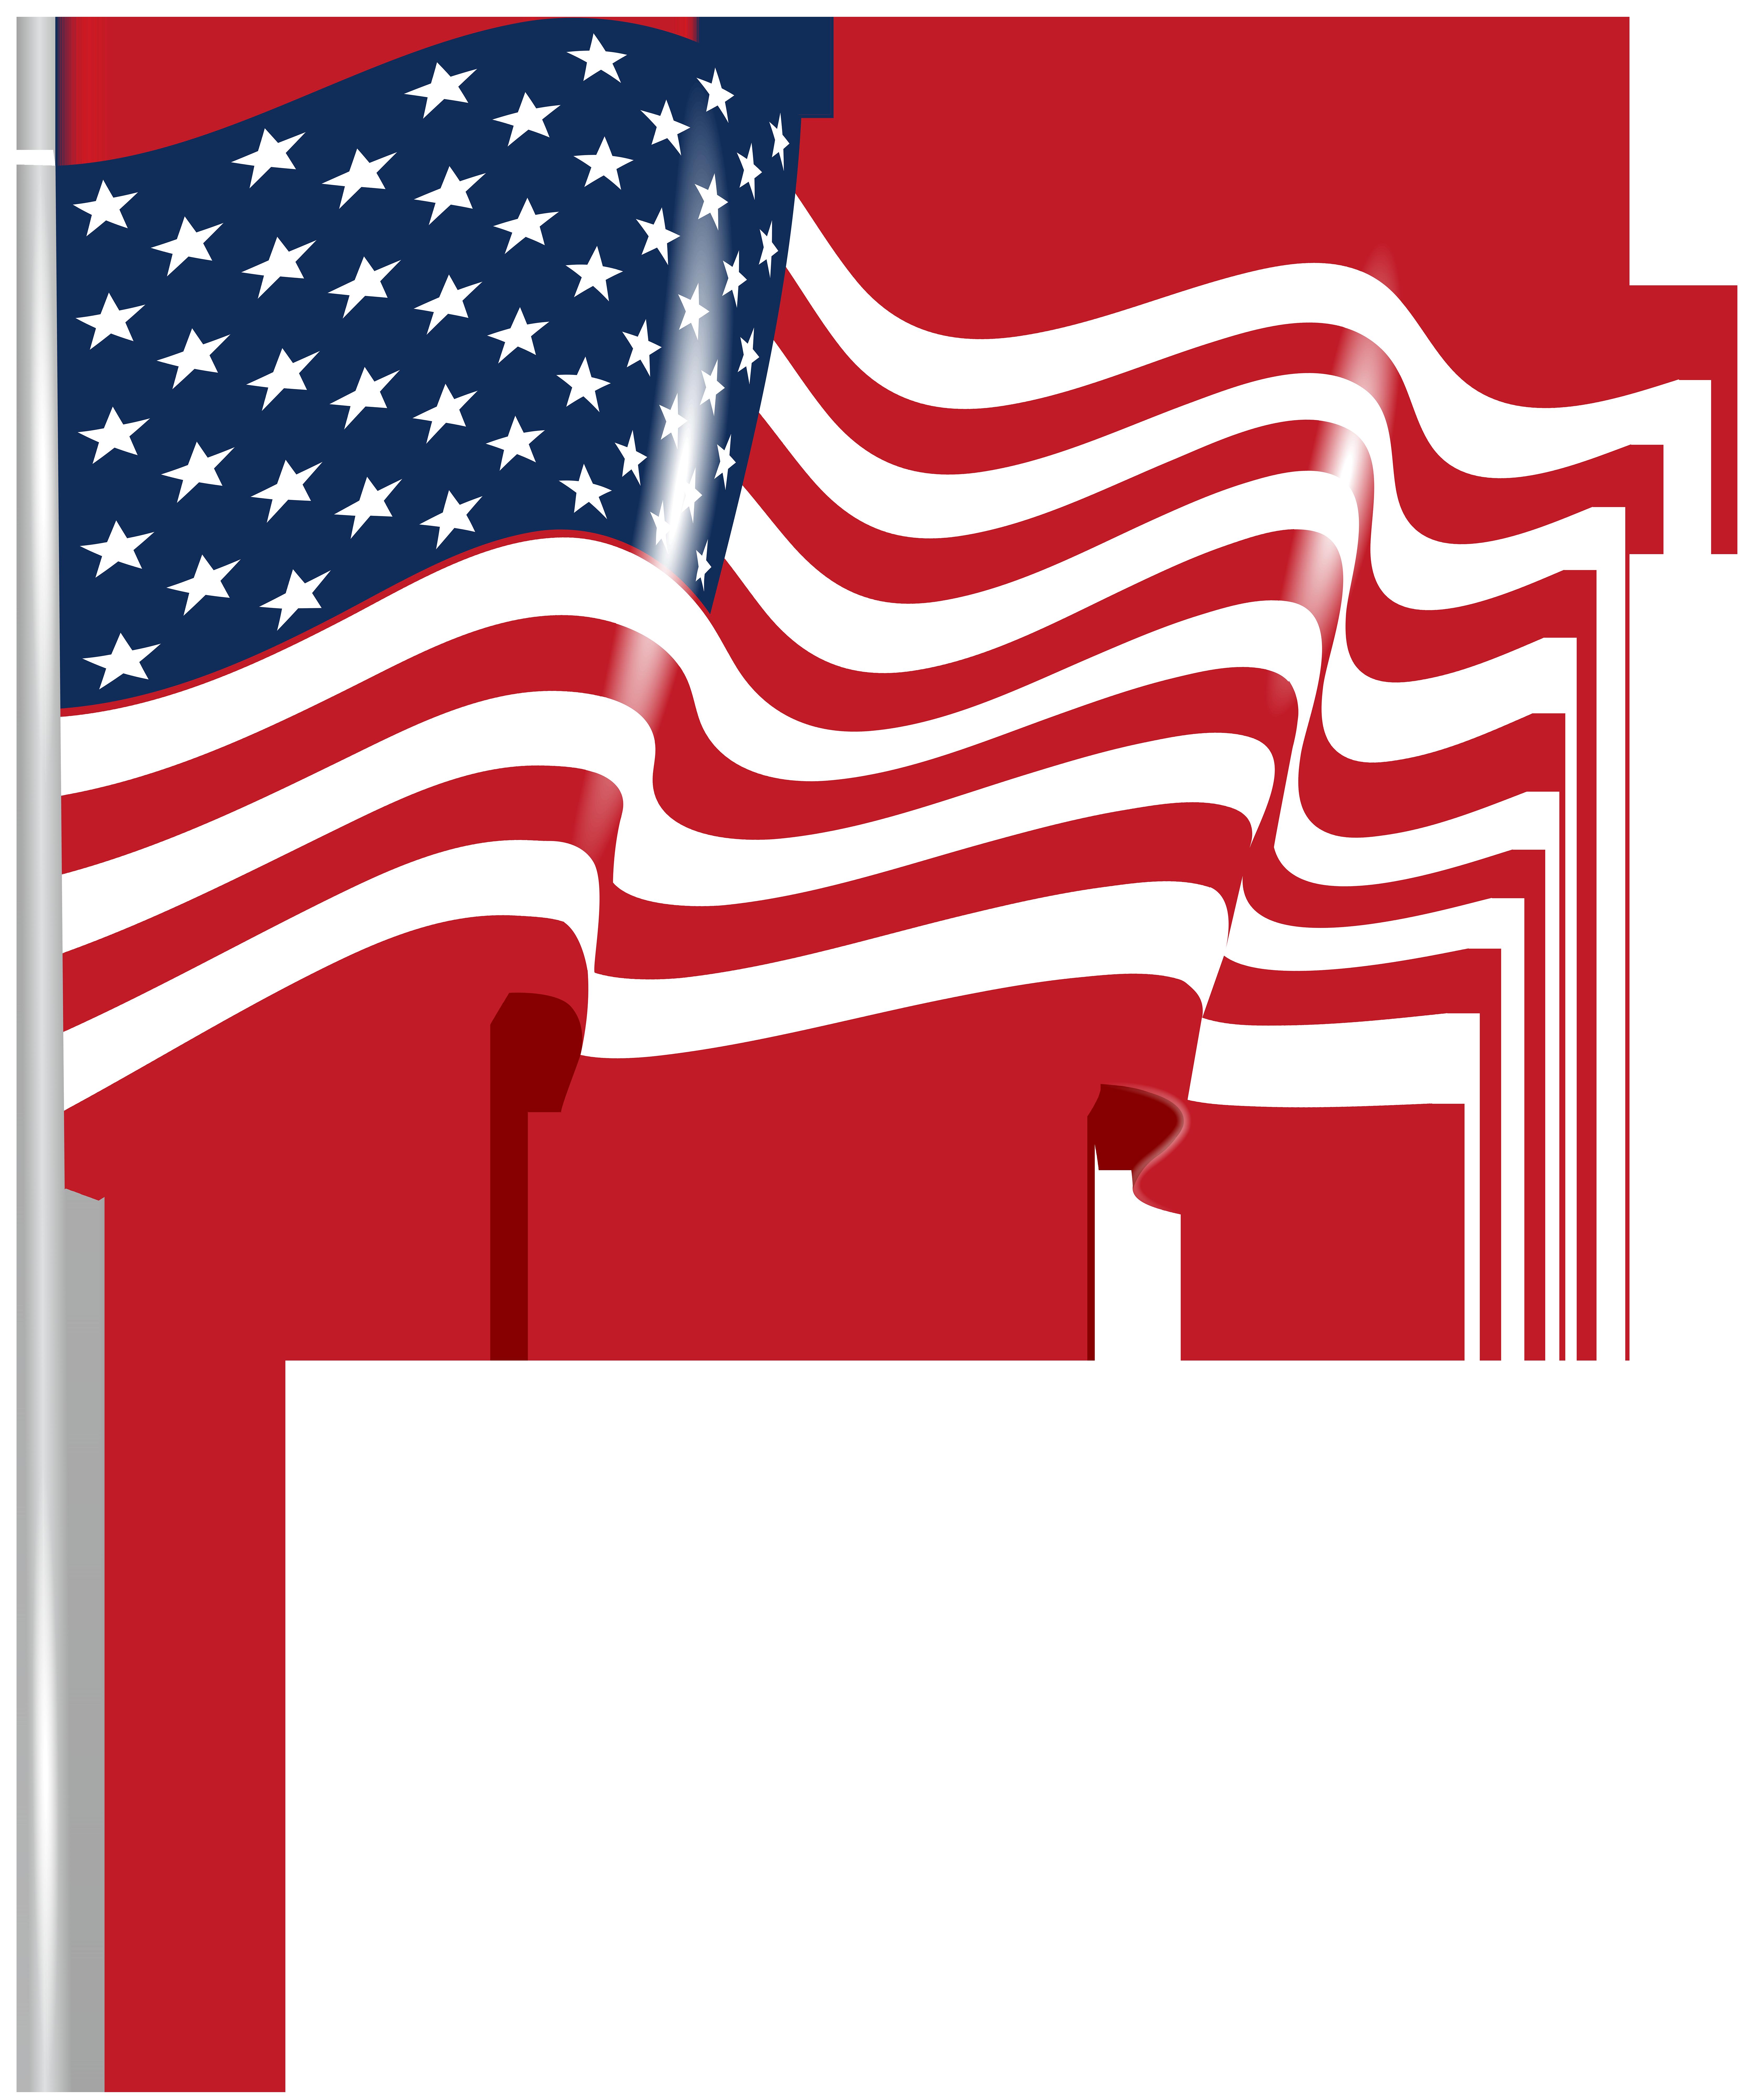 US Waving Flag Transparent PNG Clip Art Image.